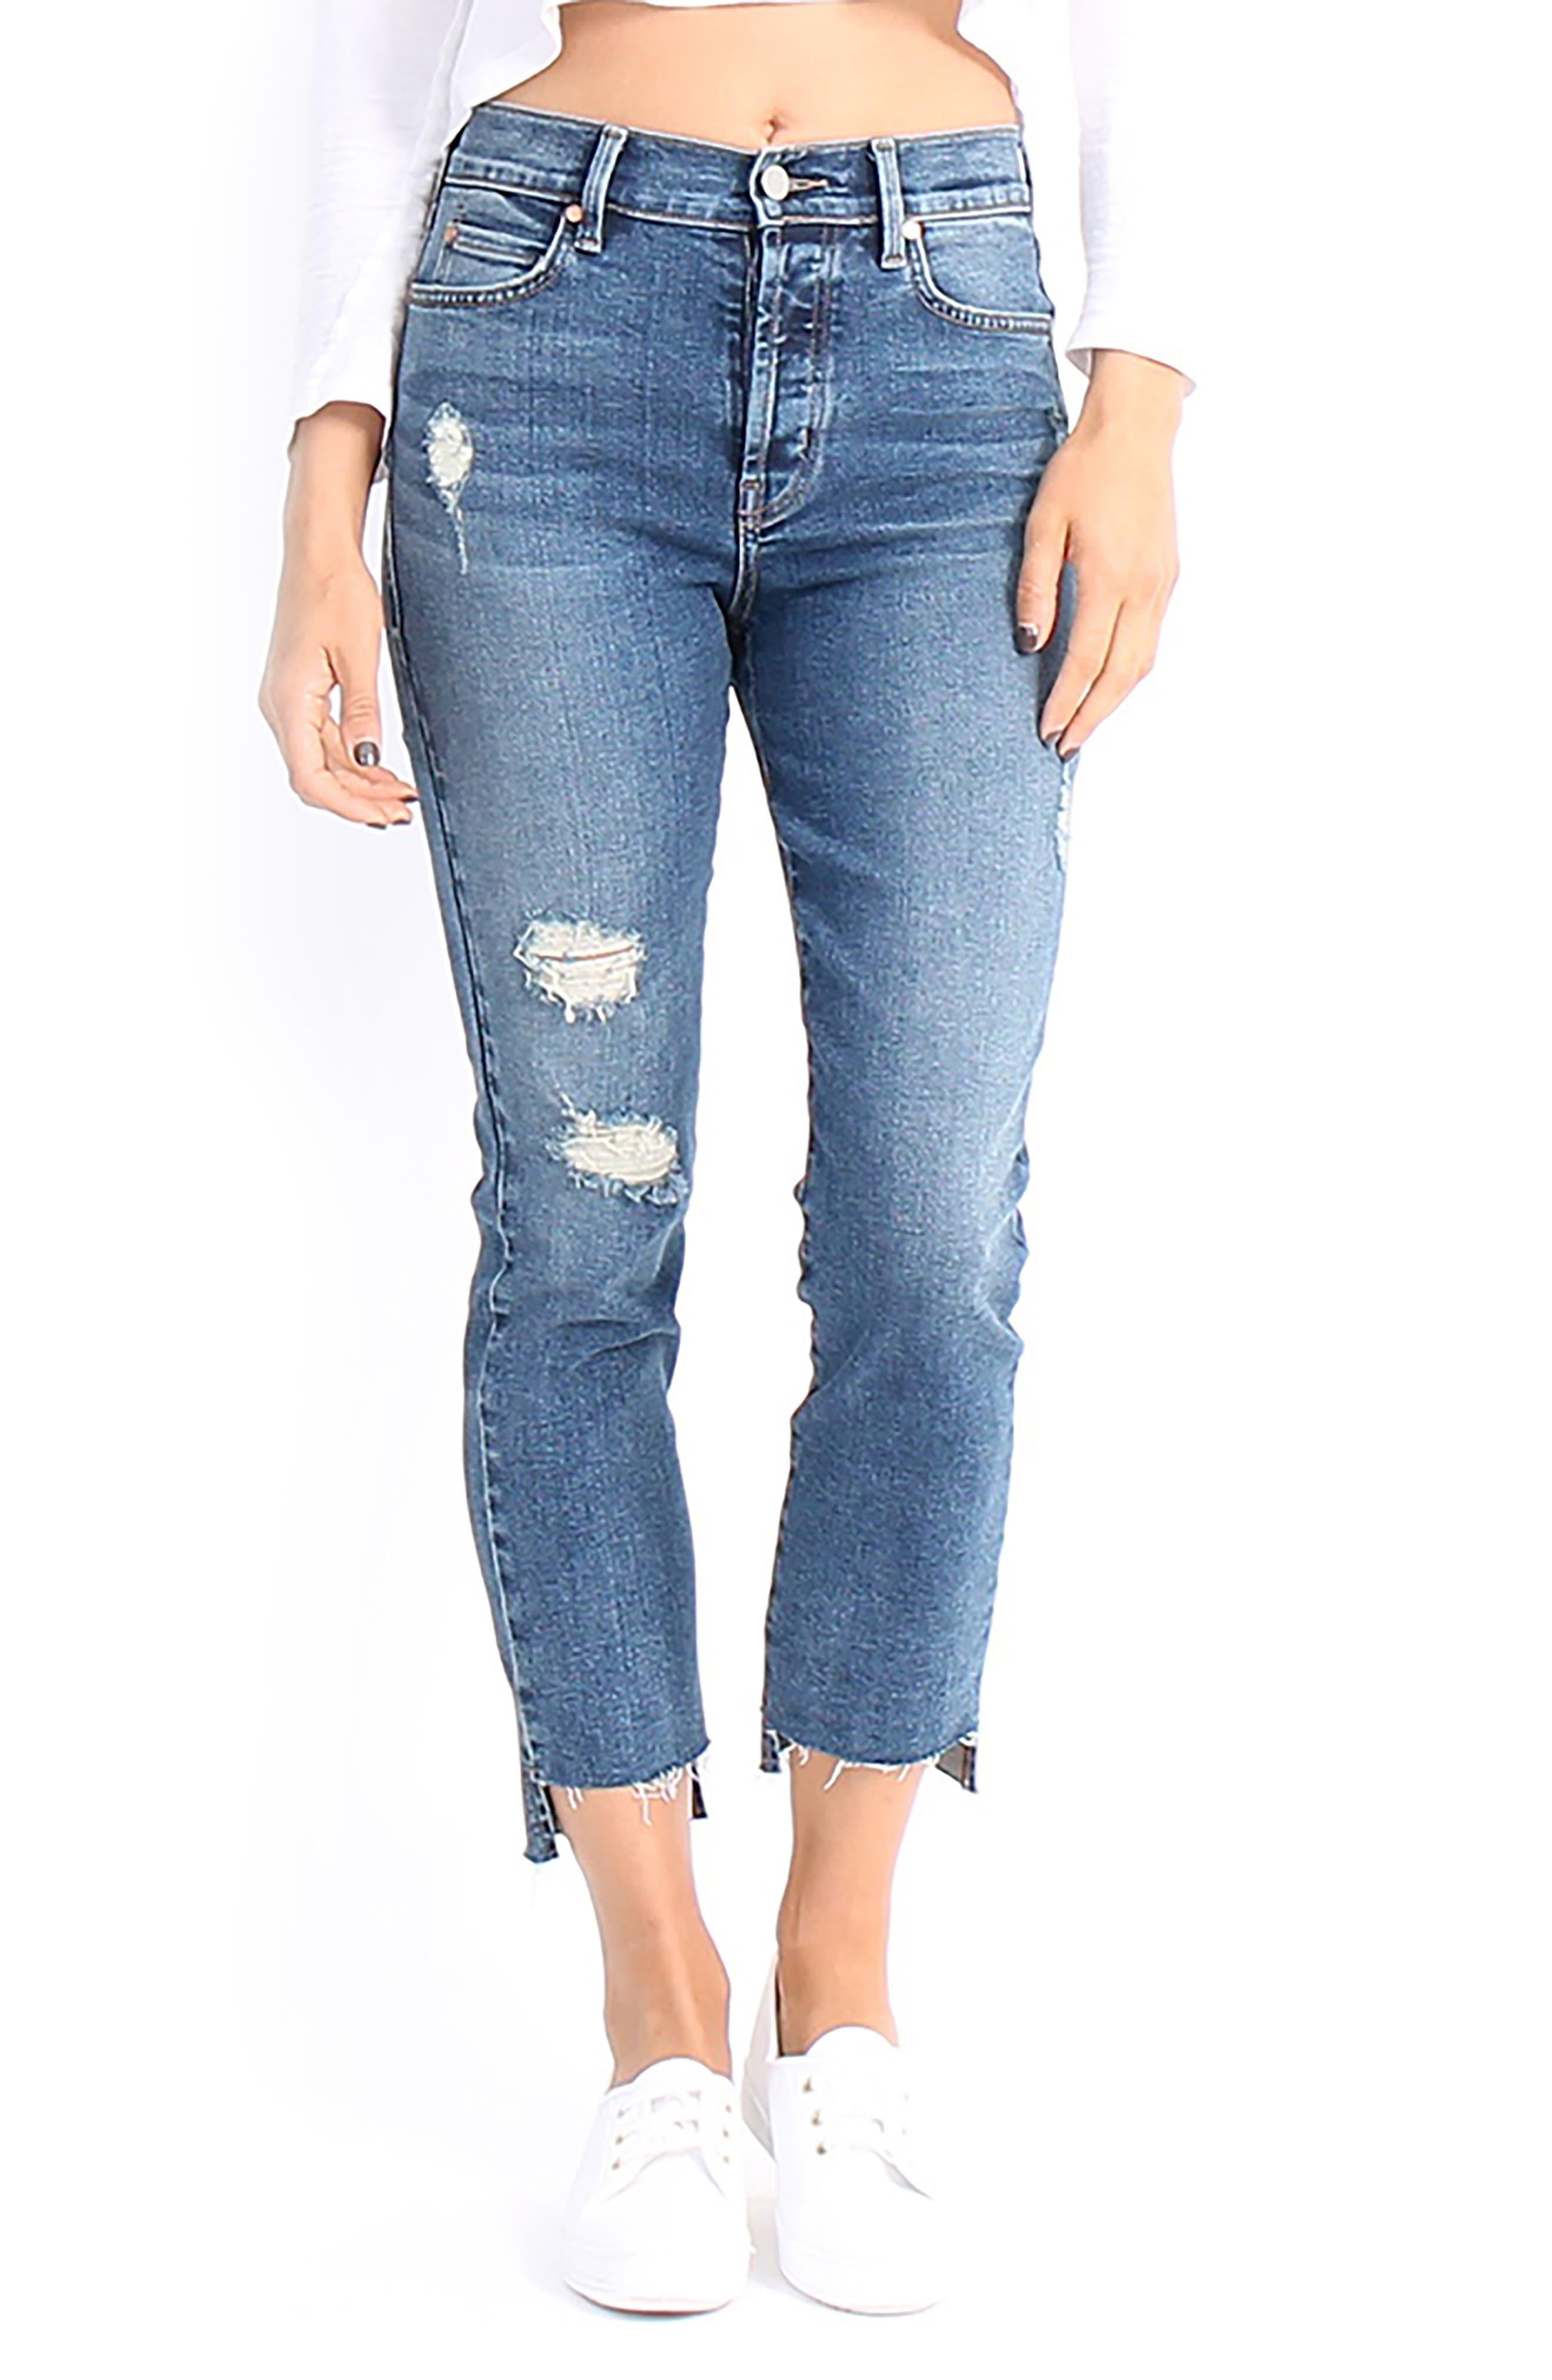 Skylar High-Waist Step Hem Distressed Jeans,                         Main,                         color, 411